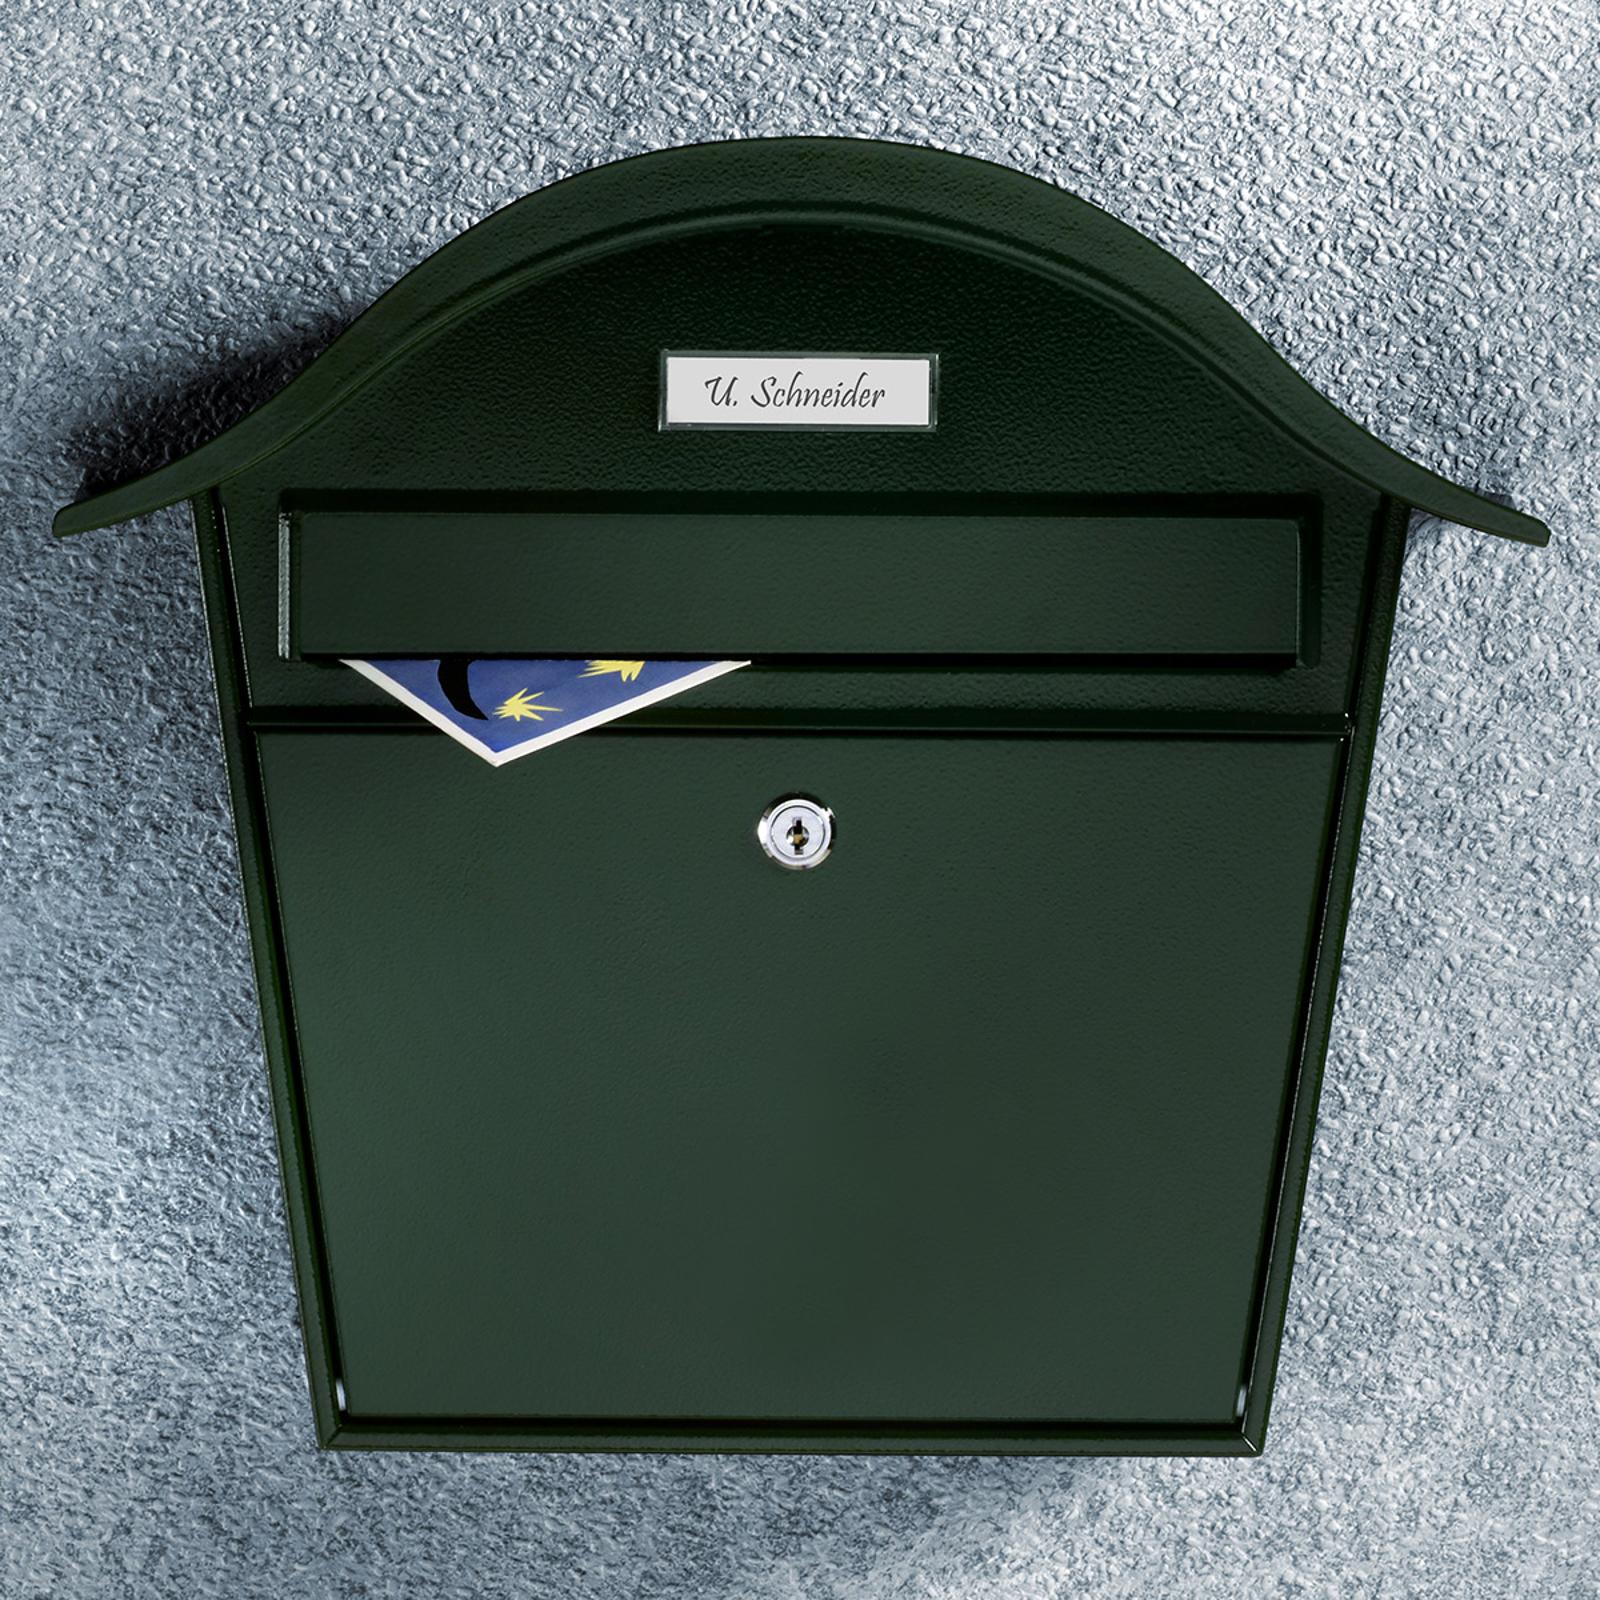 Cassetta postale Holiday 5842, acciaio color verde